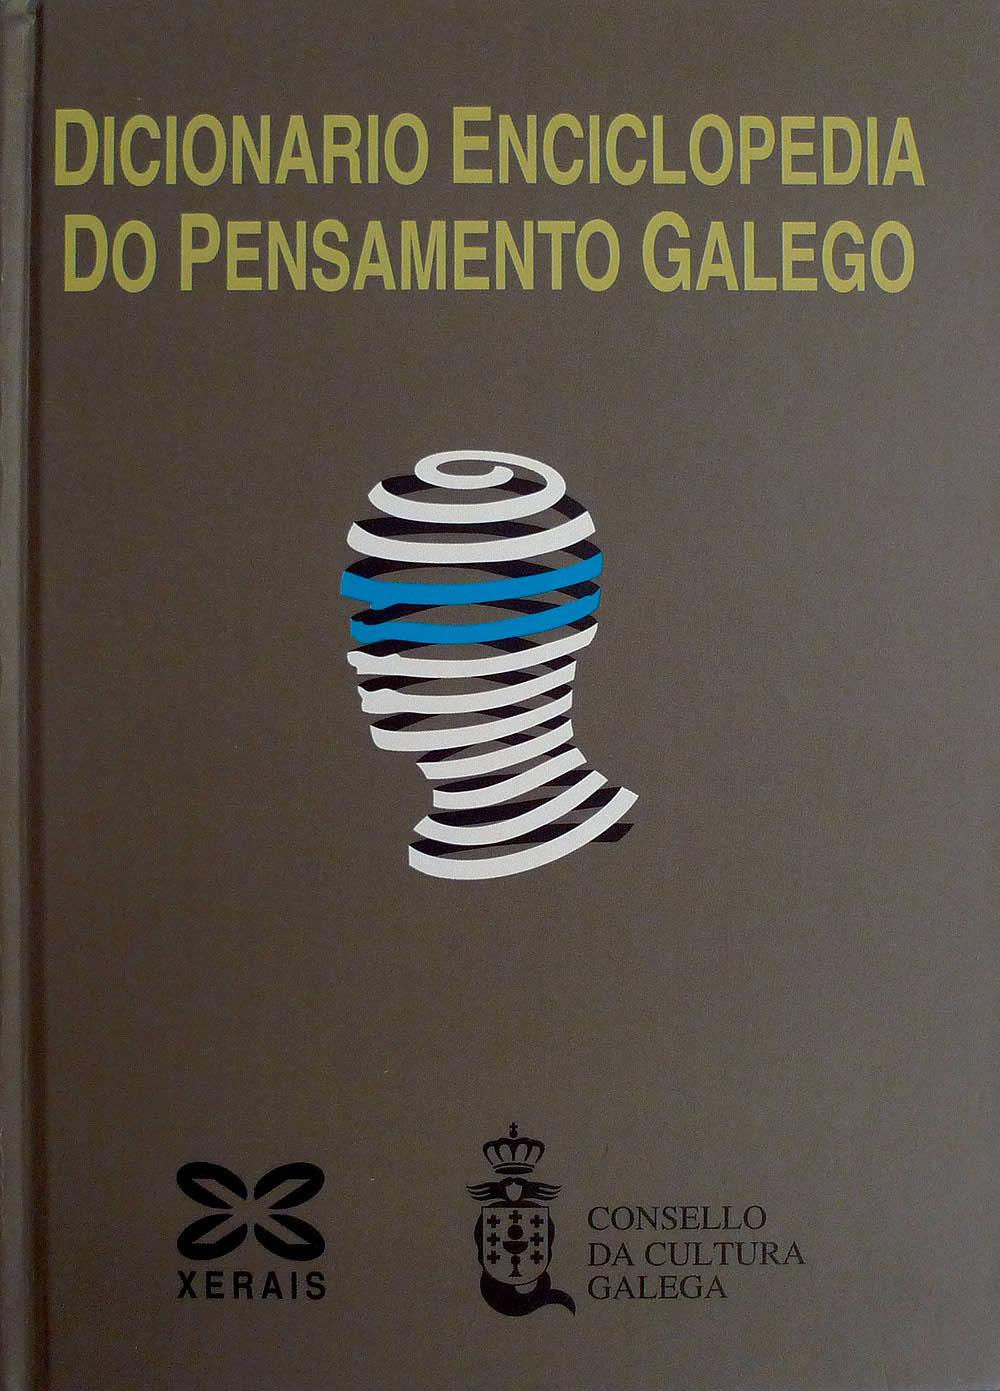 Portada de  Dicionario enciclopedia do pensamento galego